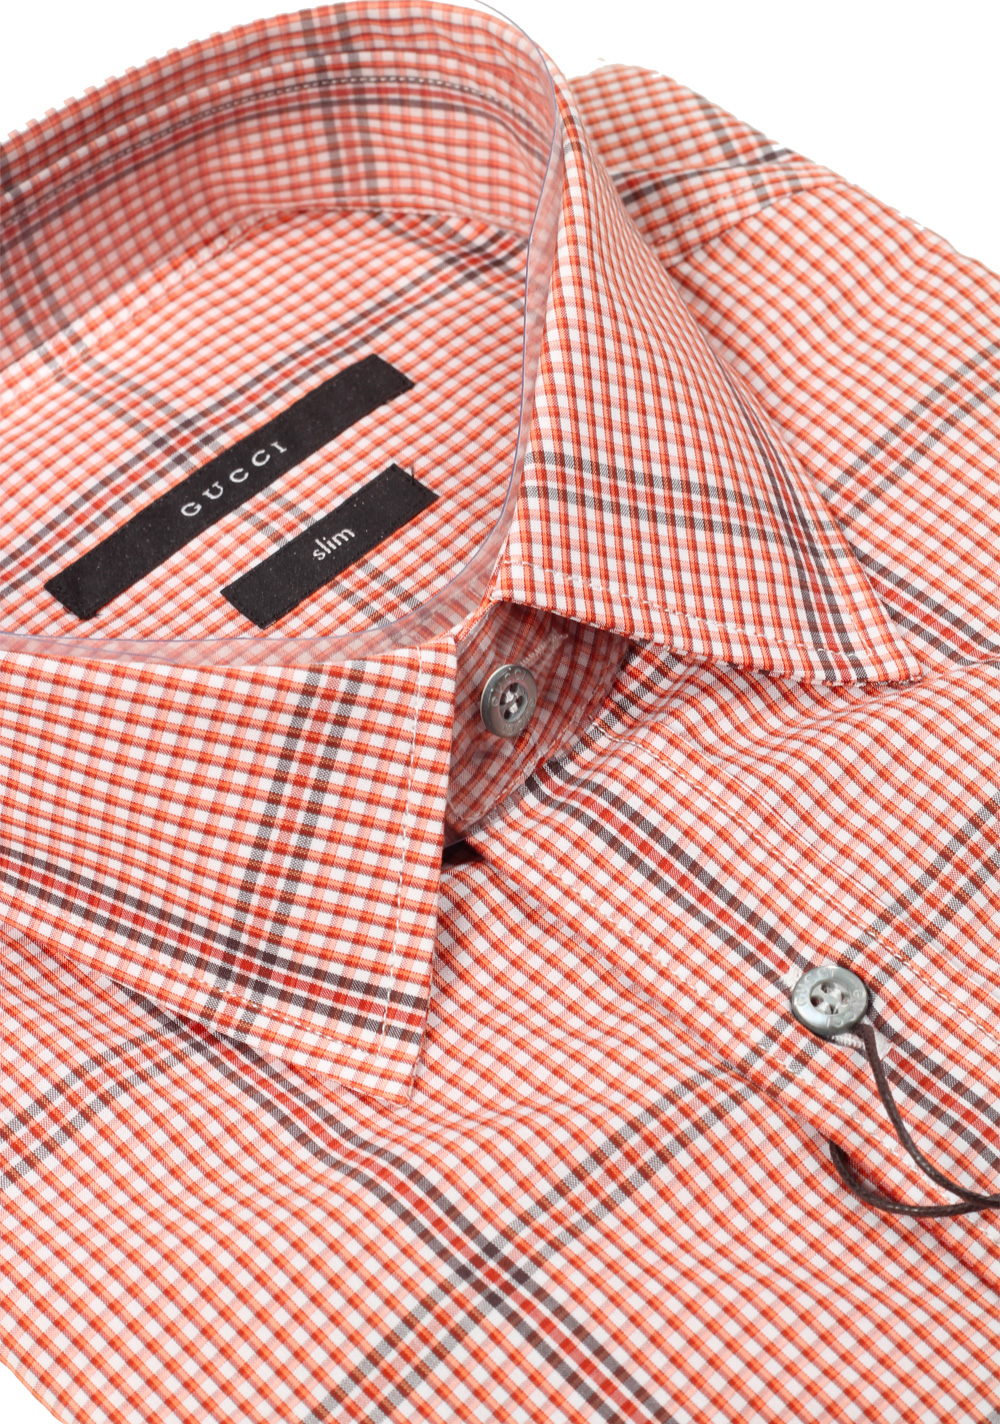 Gucci Checked Orange Dress Shirt Size 40 / 15,75 U.S. Slim | Costume Limité